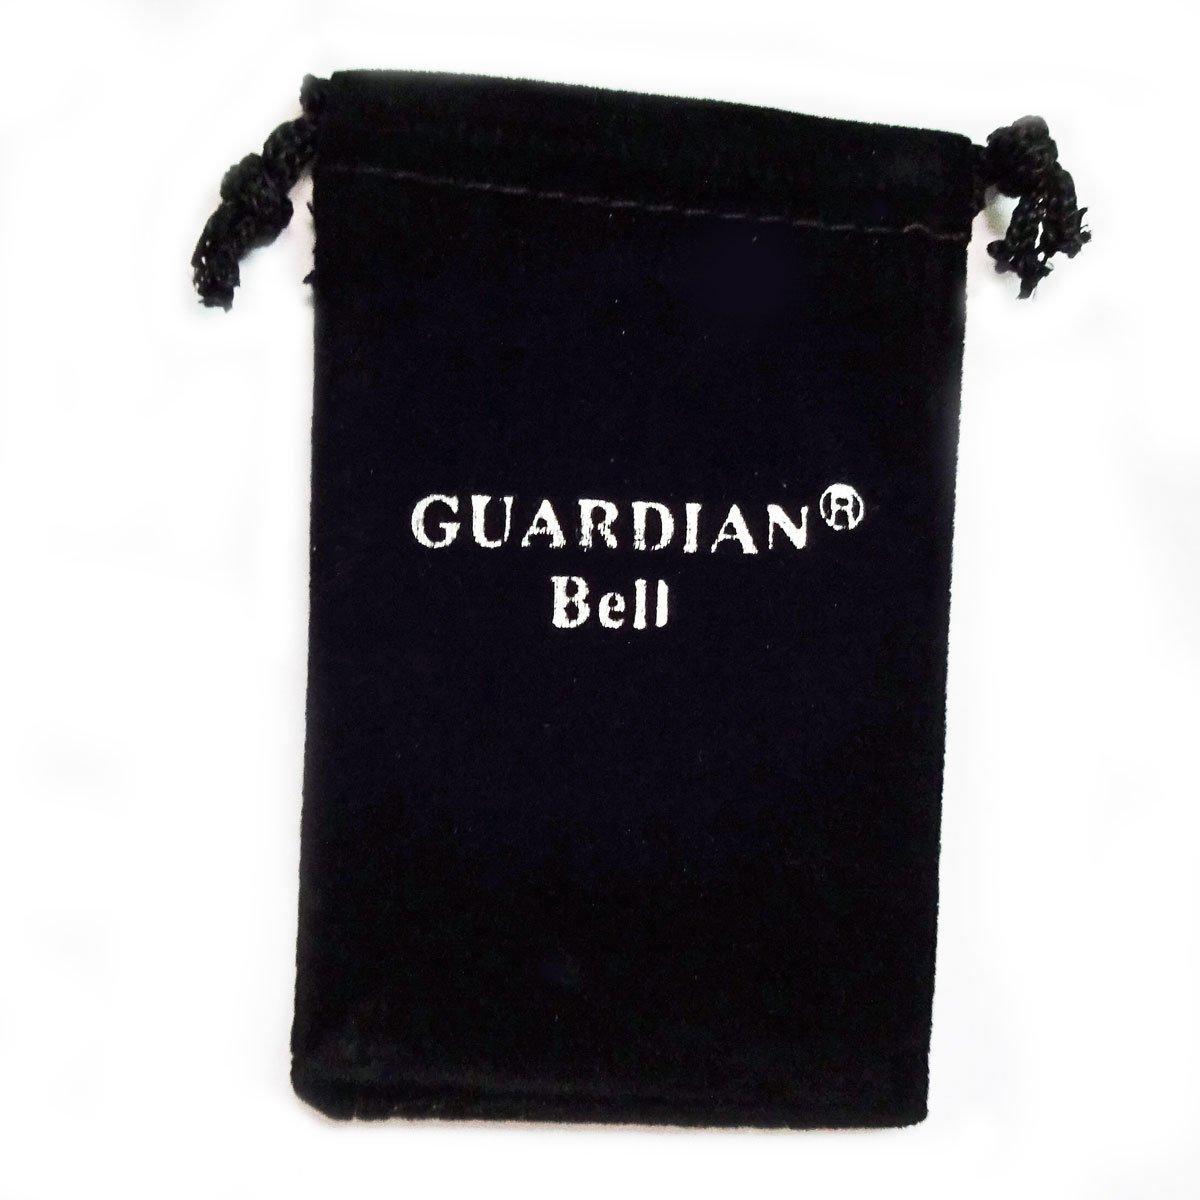 Guardian/® Irish Celtic Weave Motorcycle Biker Luck Gremlin Riding Bell or Key Ring Guardian® Bell GBWEAV